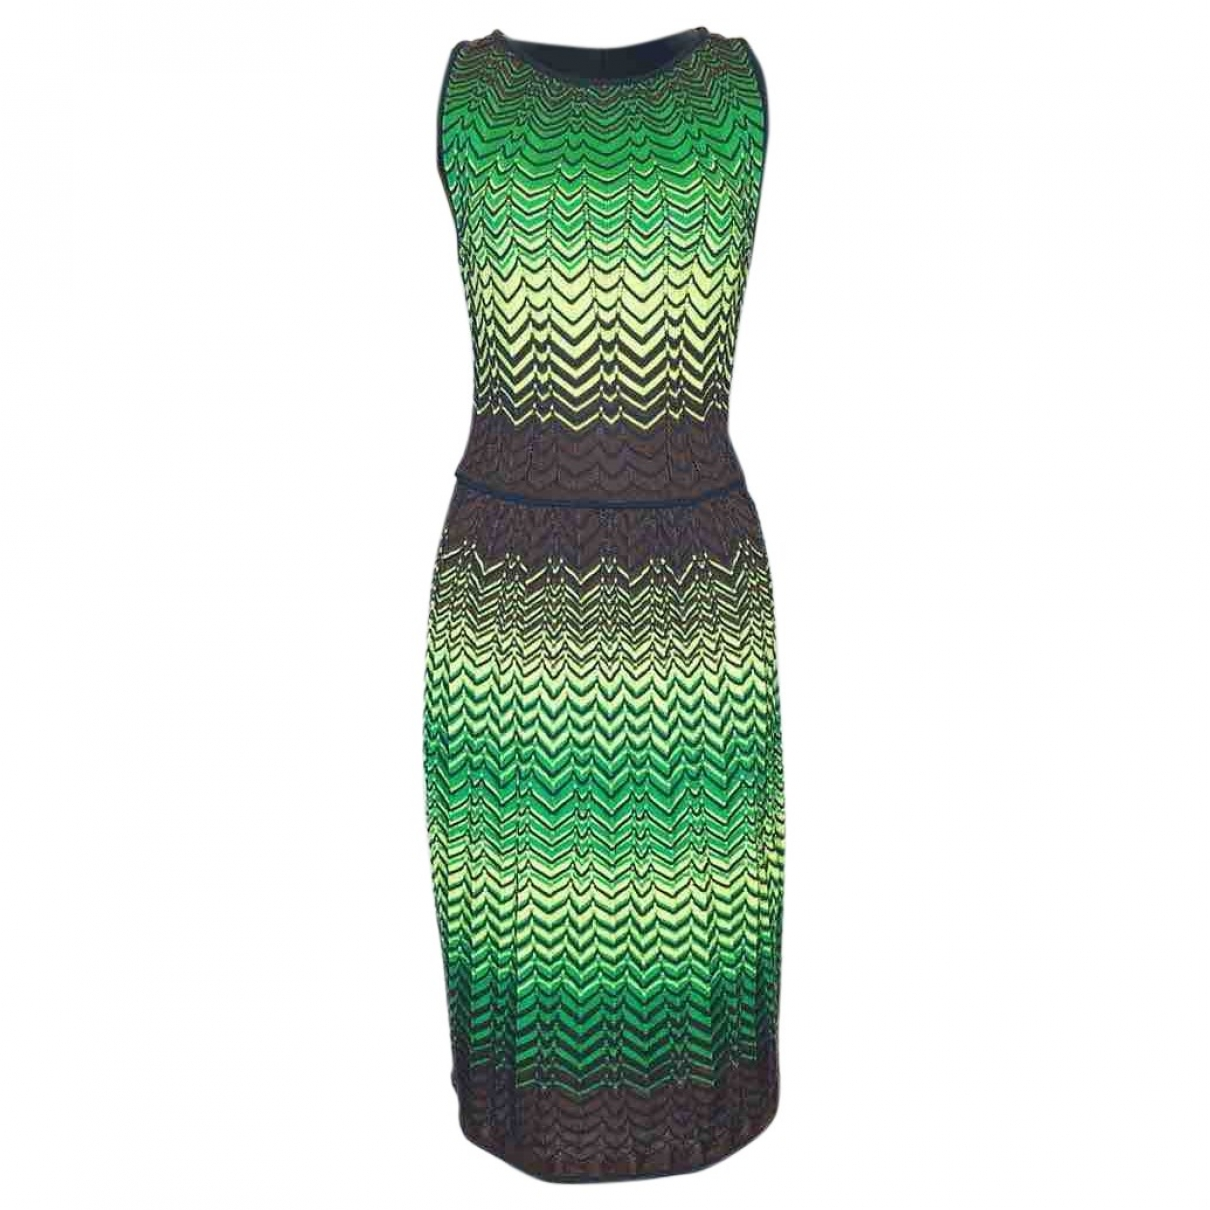 M Missoni \N Green dress for Women 38 IT